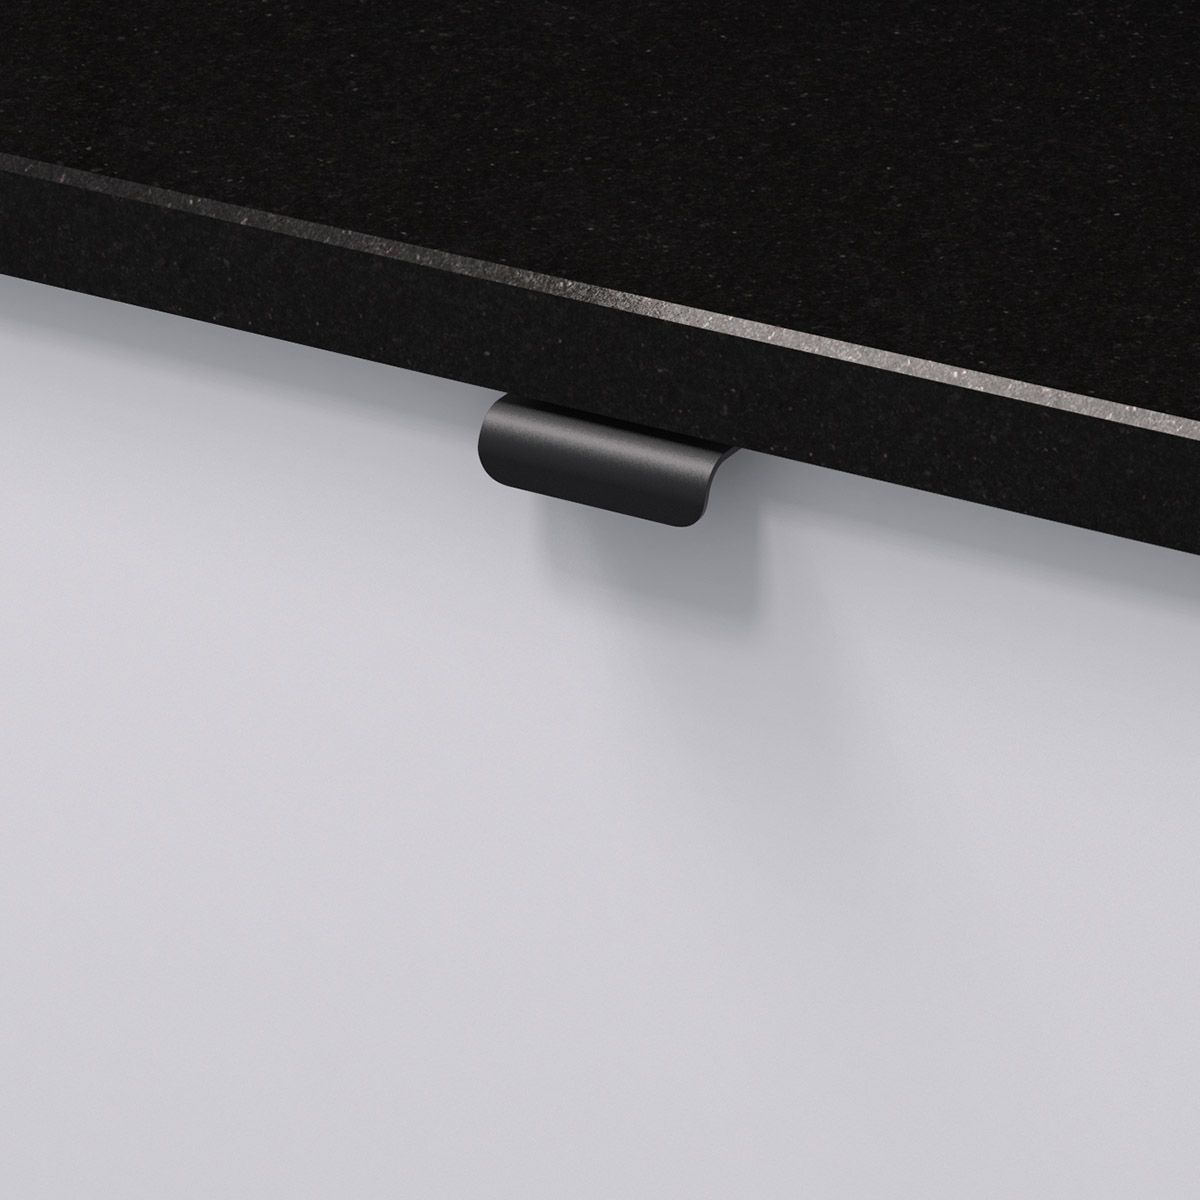 Profilhandtag lip svart 343454 11 40 mm ncs s 0300 n granit svart